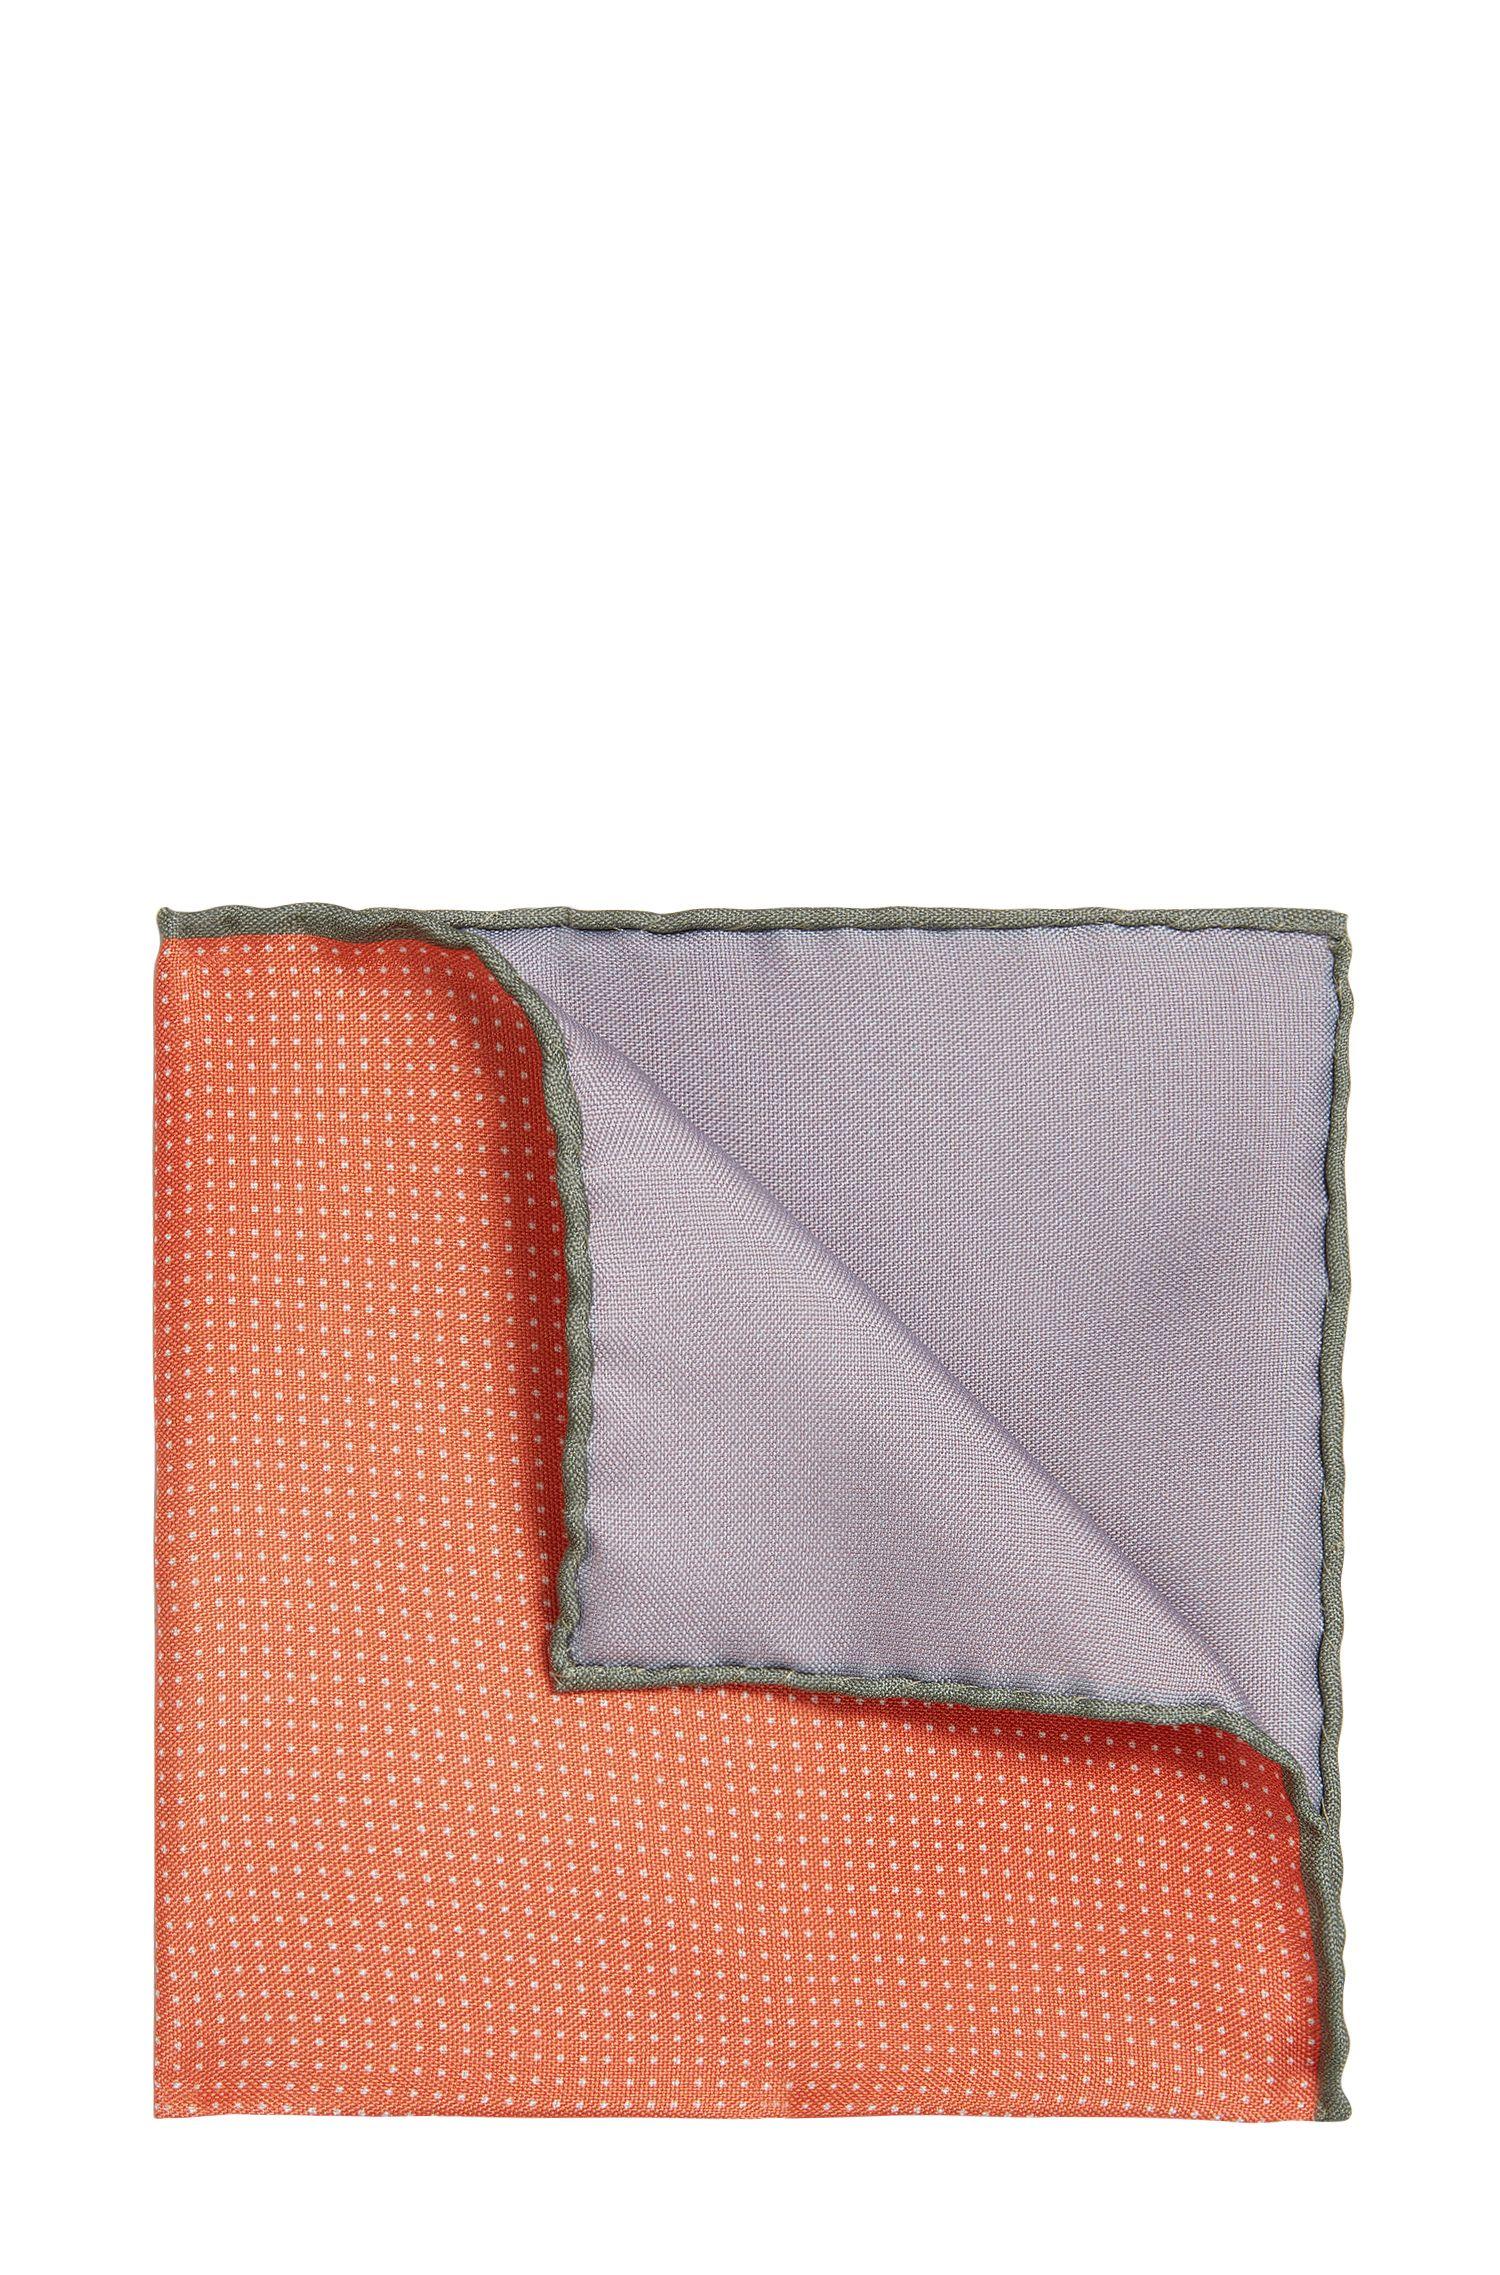 Pañuelo de bolsillo de la línea Tailored en seda con puntos: 'T-Pocket sq. 33x33 cm'